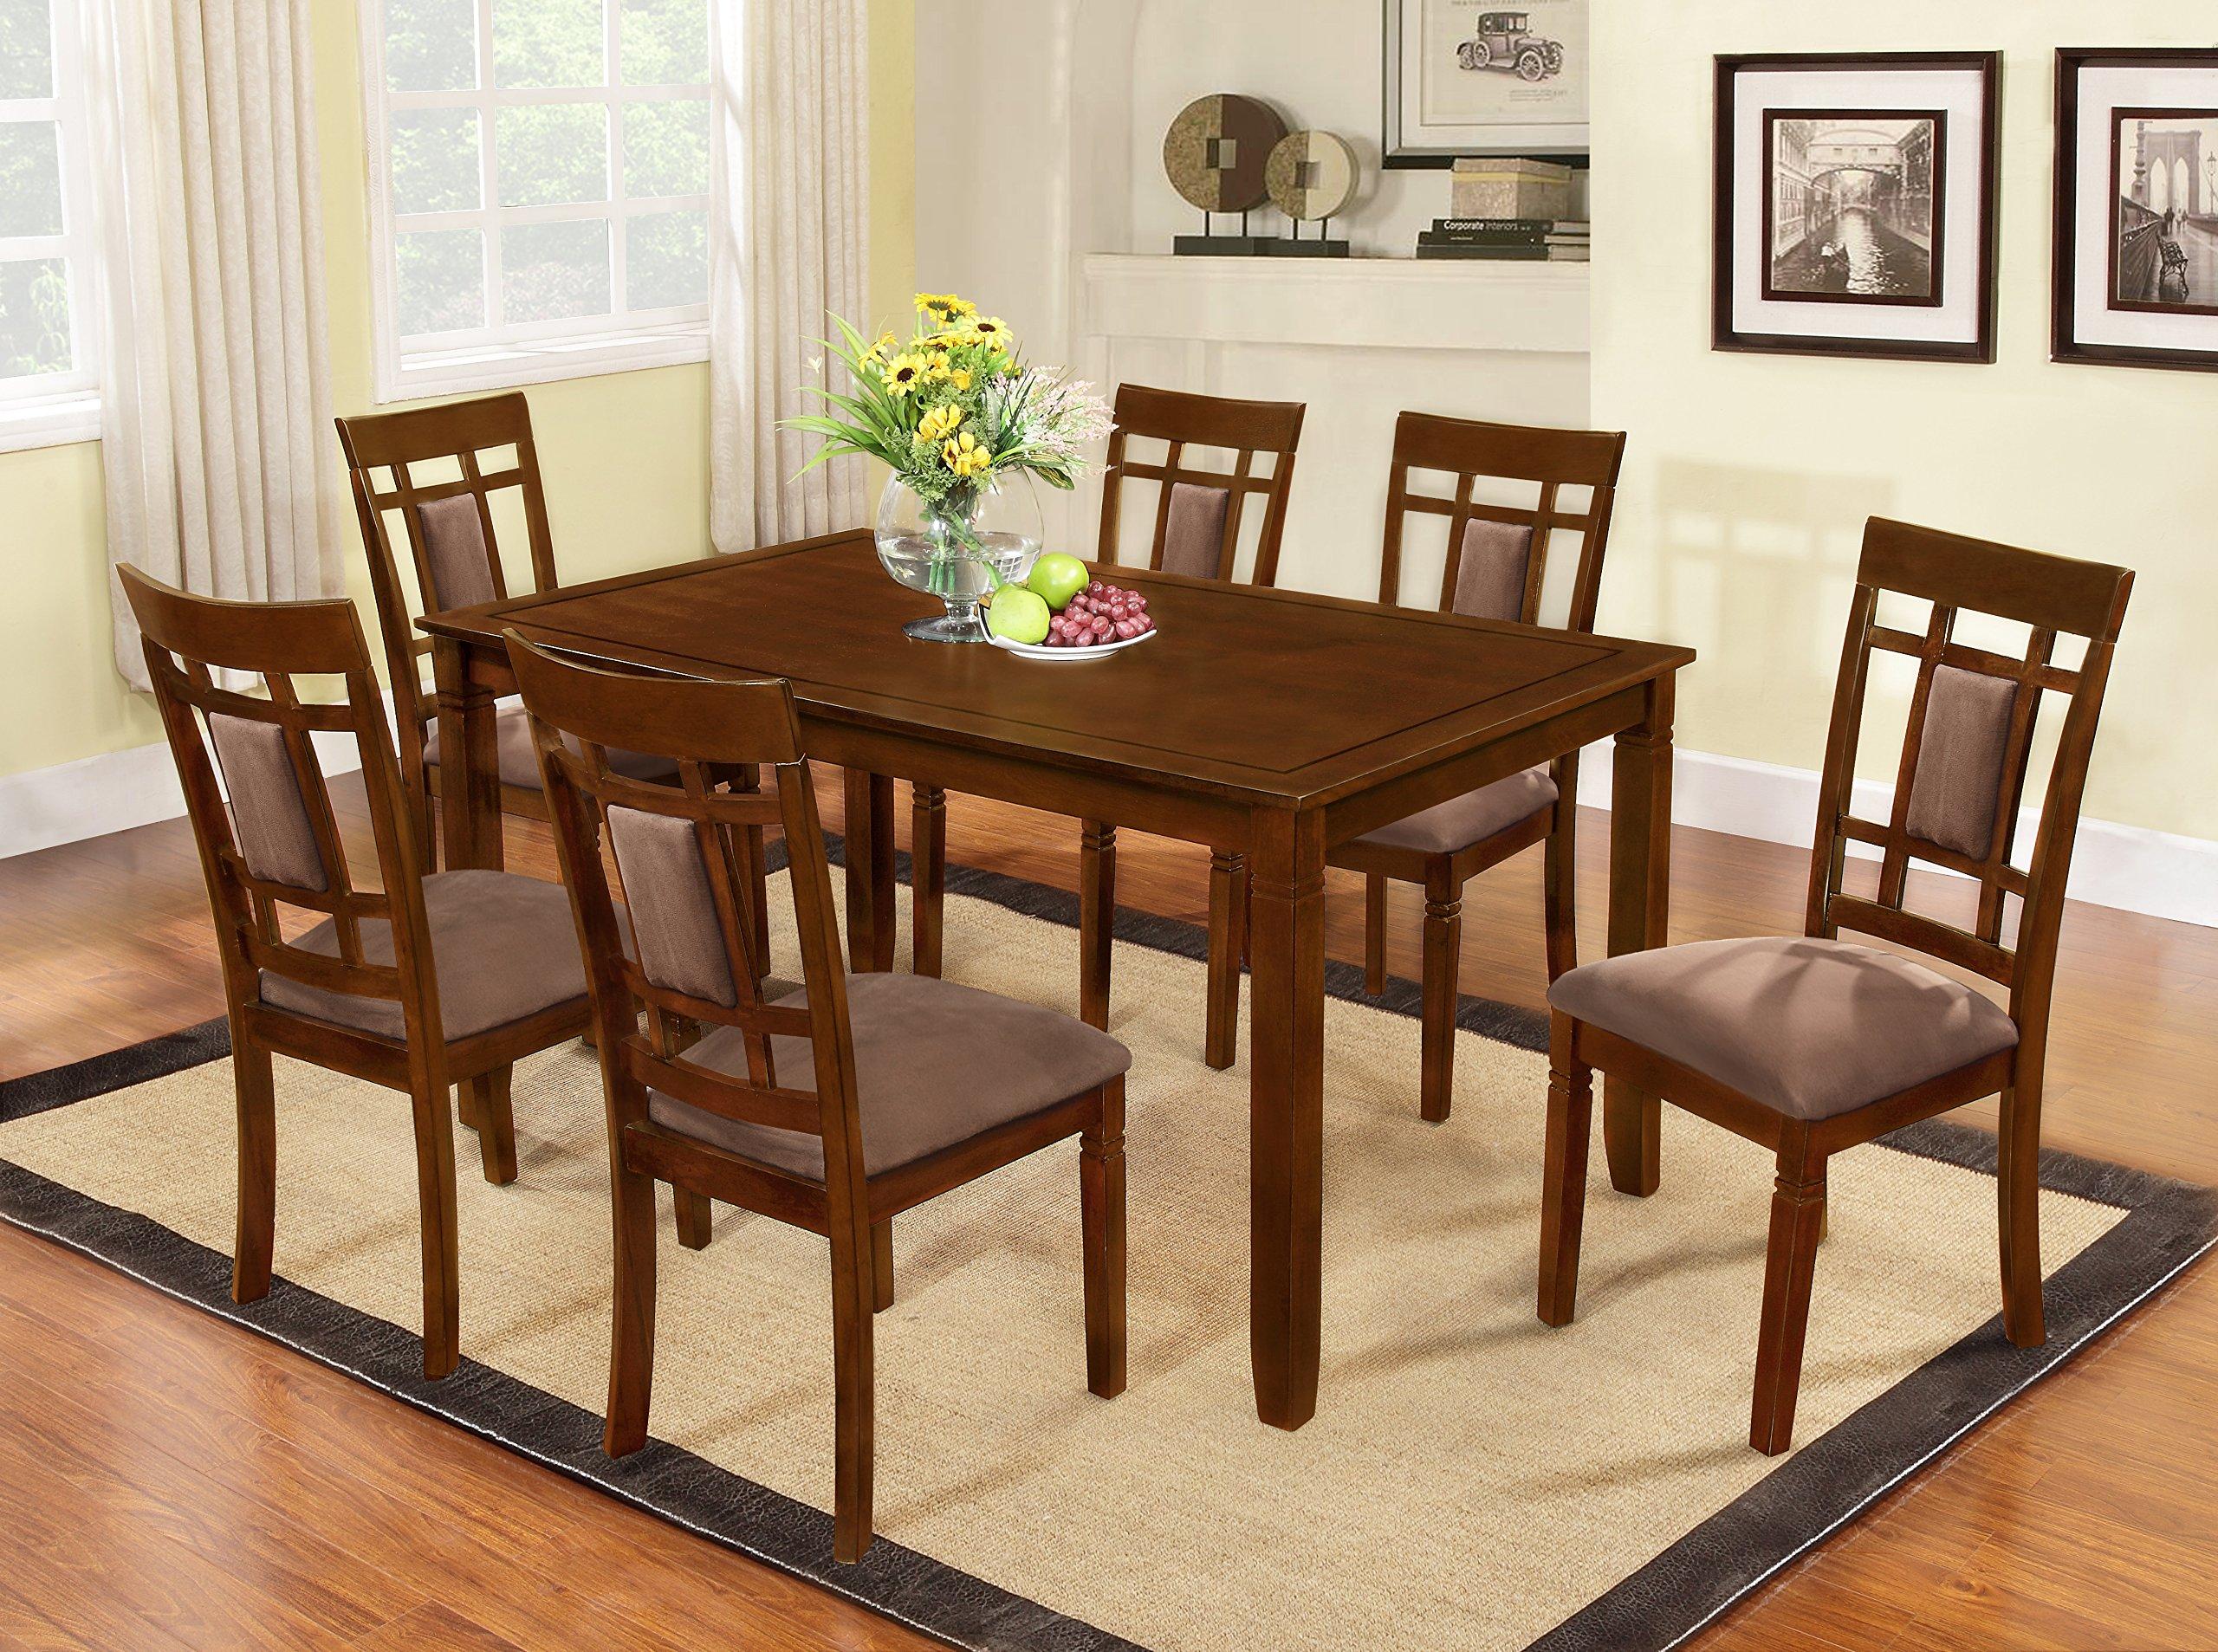 cherry wood dining table amazon com rh amazon com Cherry Sofa Table Accent Tables Cherry Finish